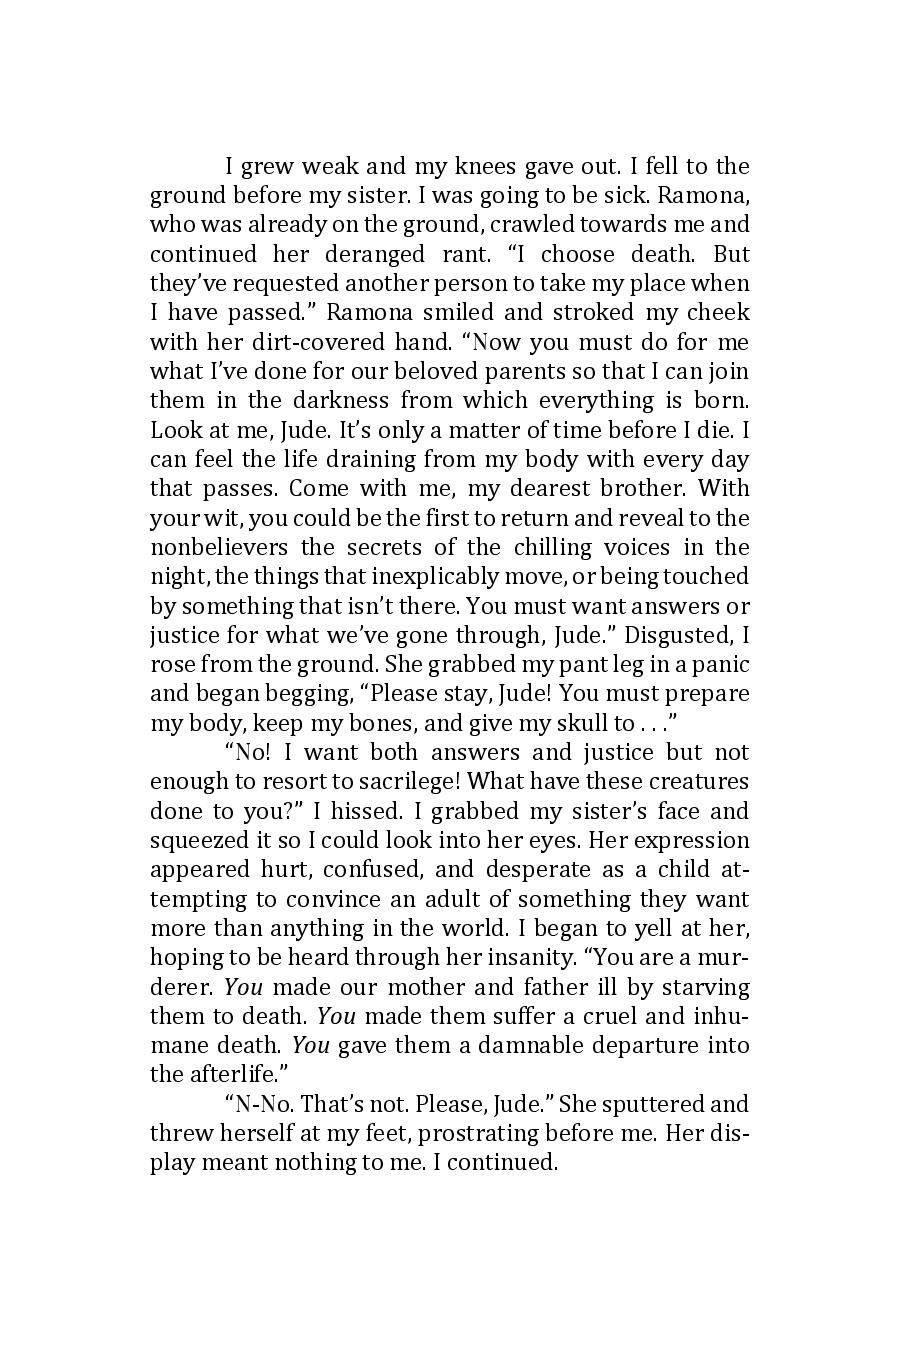 Hinnom Magazine 002 Manuscript E-Book 2-page-143